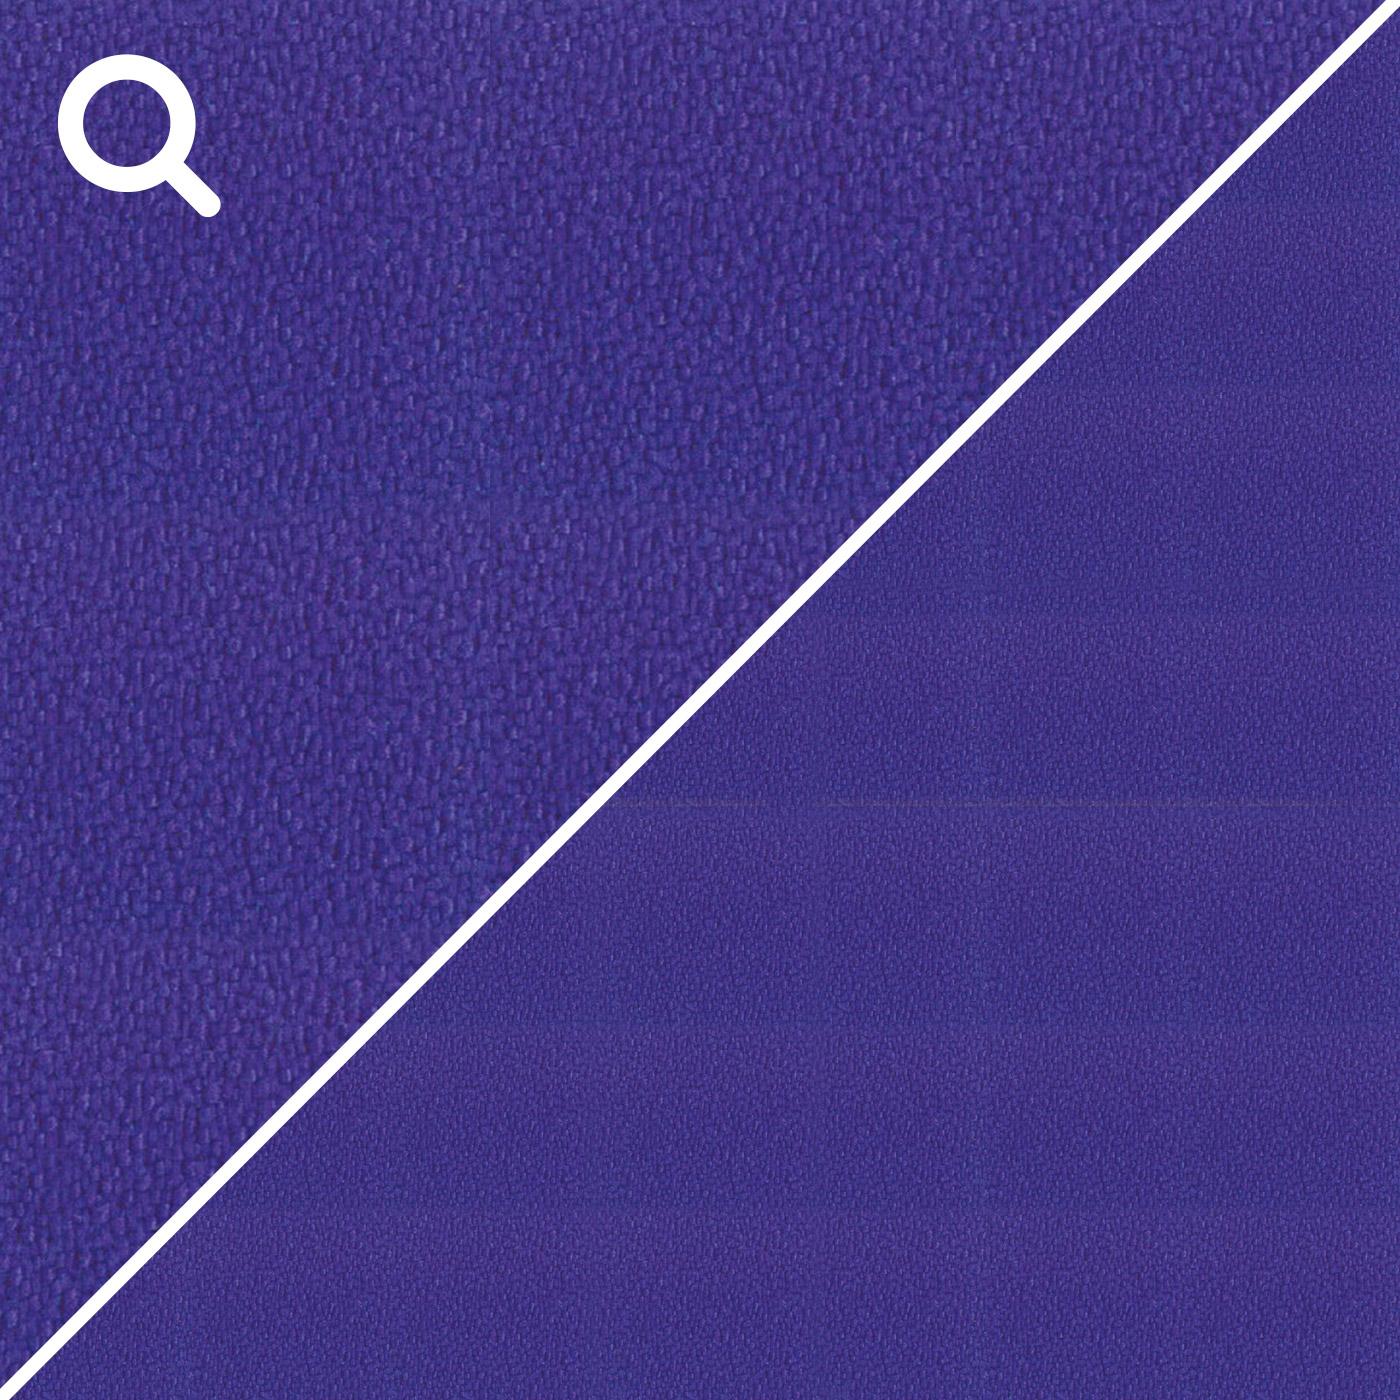 0-45-lila